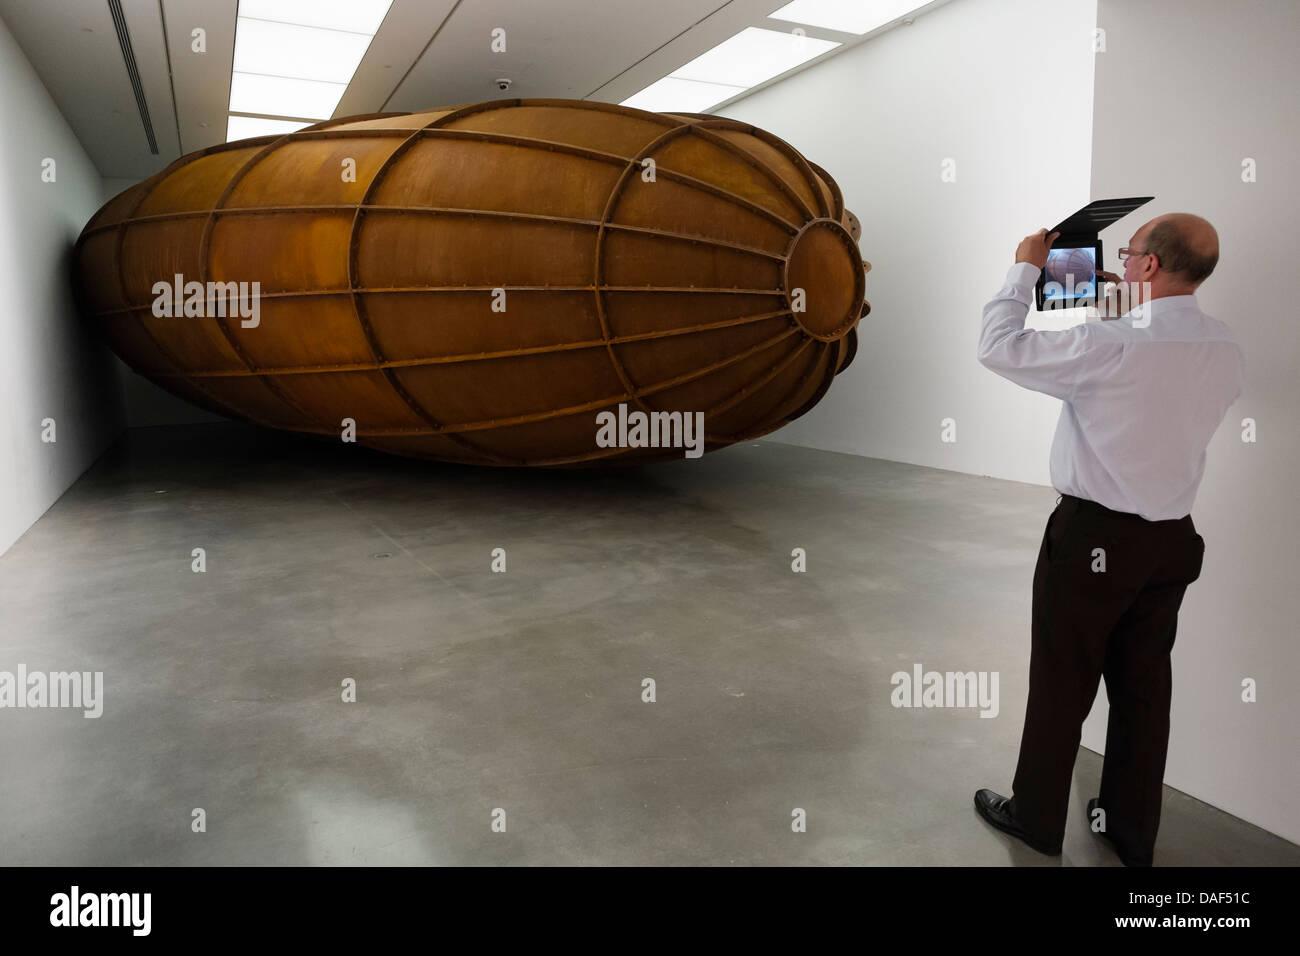 Museum of Contemporary Art in Sydney Australia - Stock Image